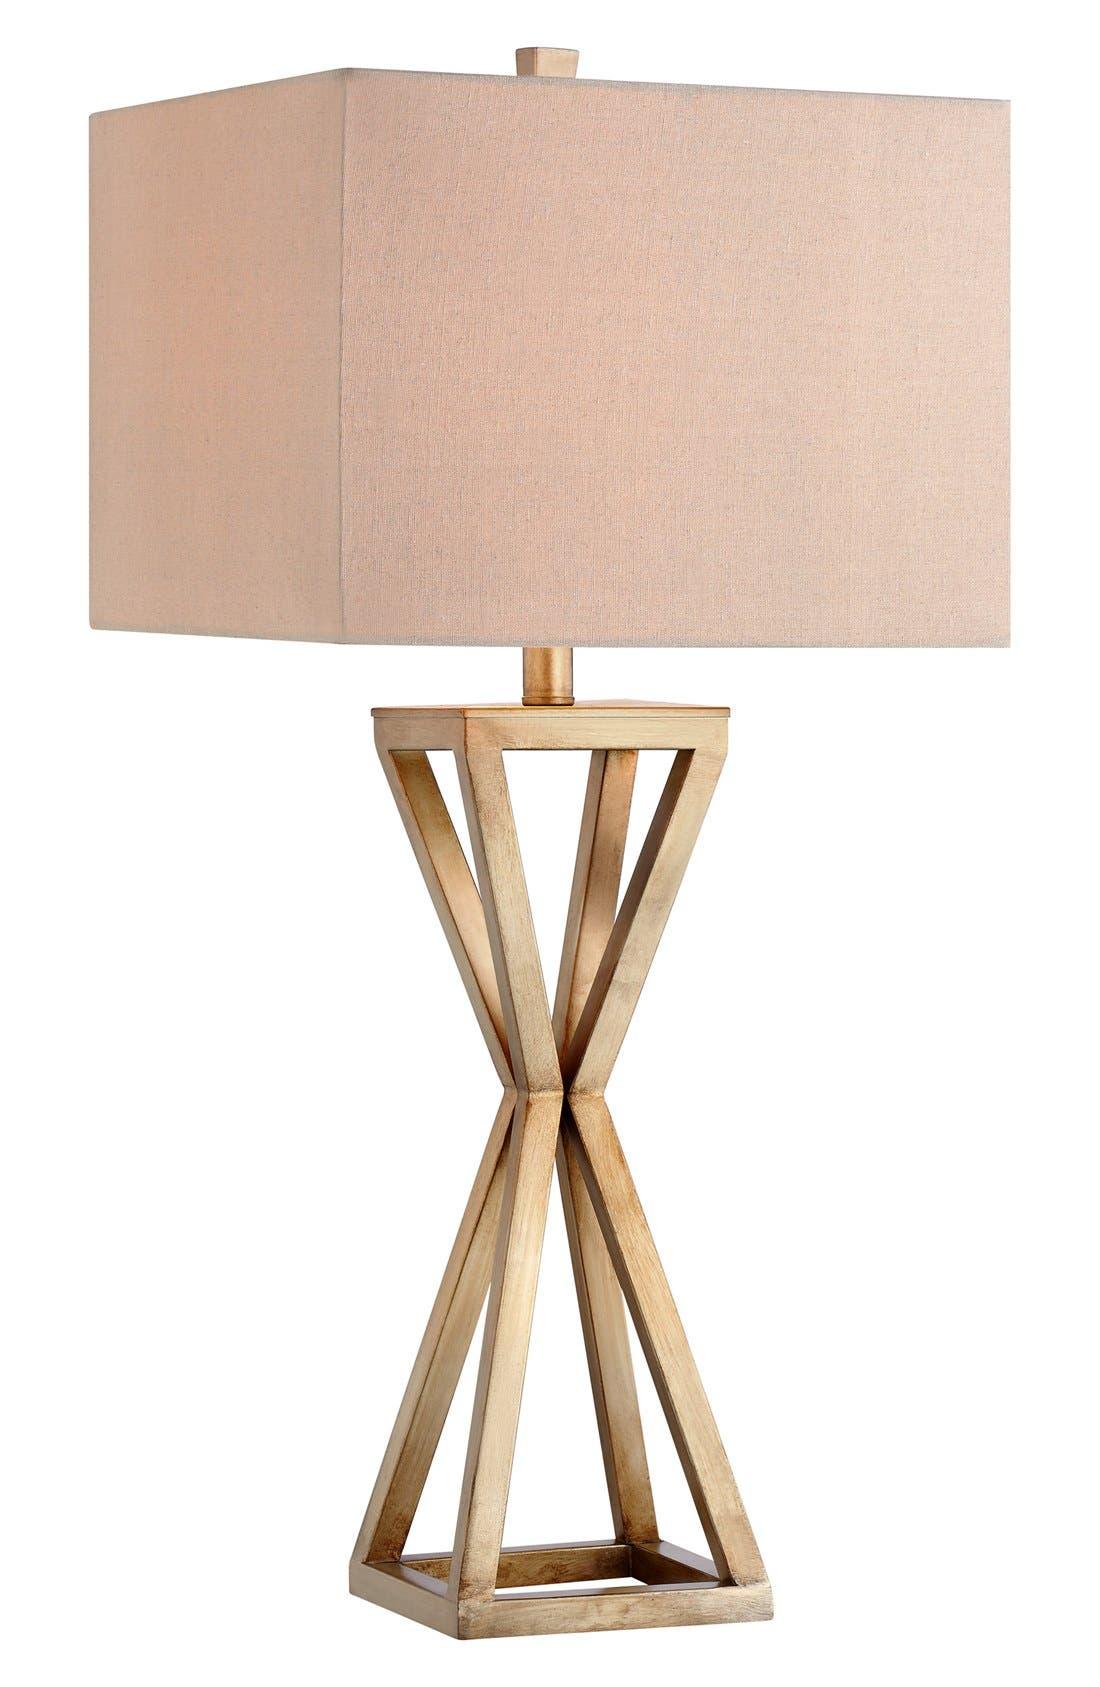 Alternate Image 1 Selected - JAlexander Lighting Open Caged Metal Table Lamp